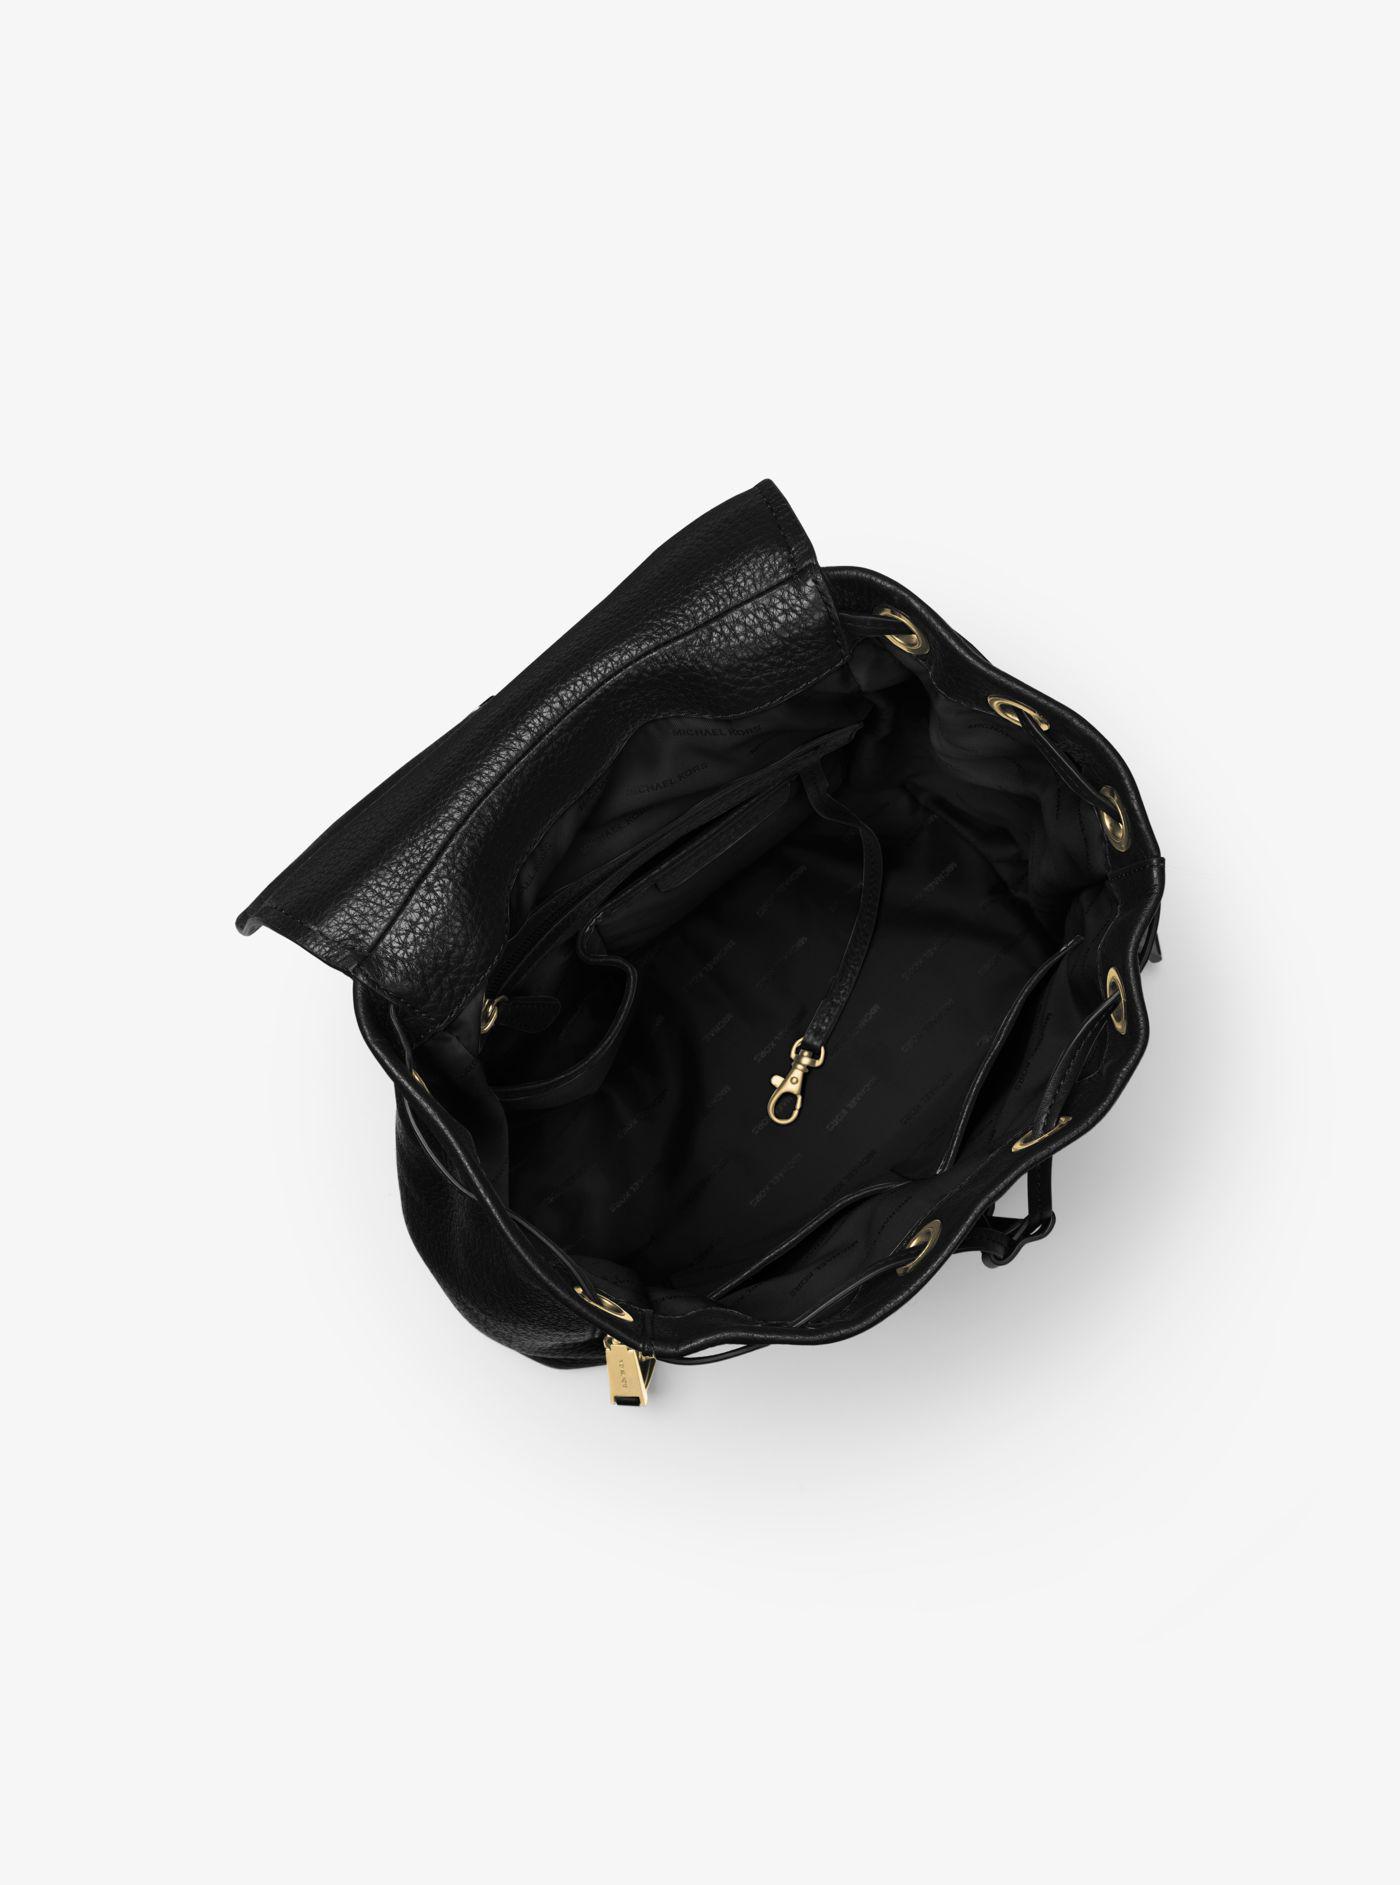 2faec8d40d60 ... discount michael kors black viv large leather backpack lyst. view  fullscreen 87808 06828